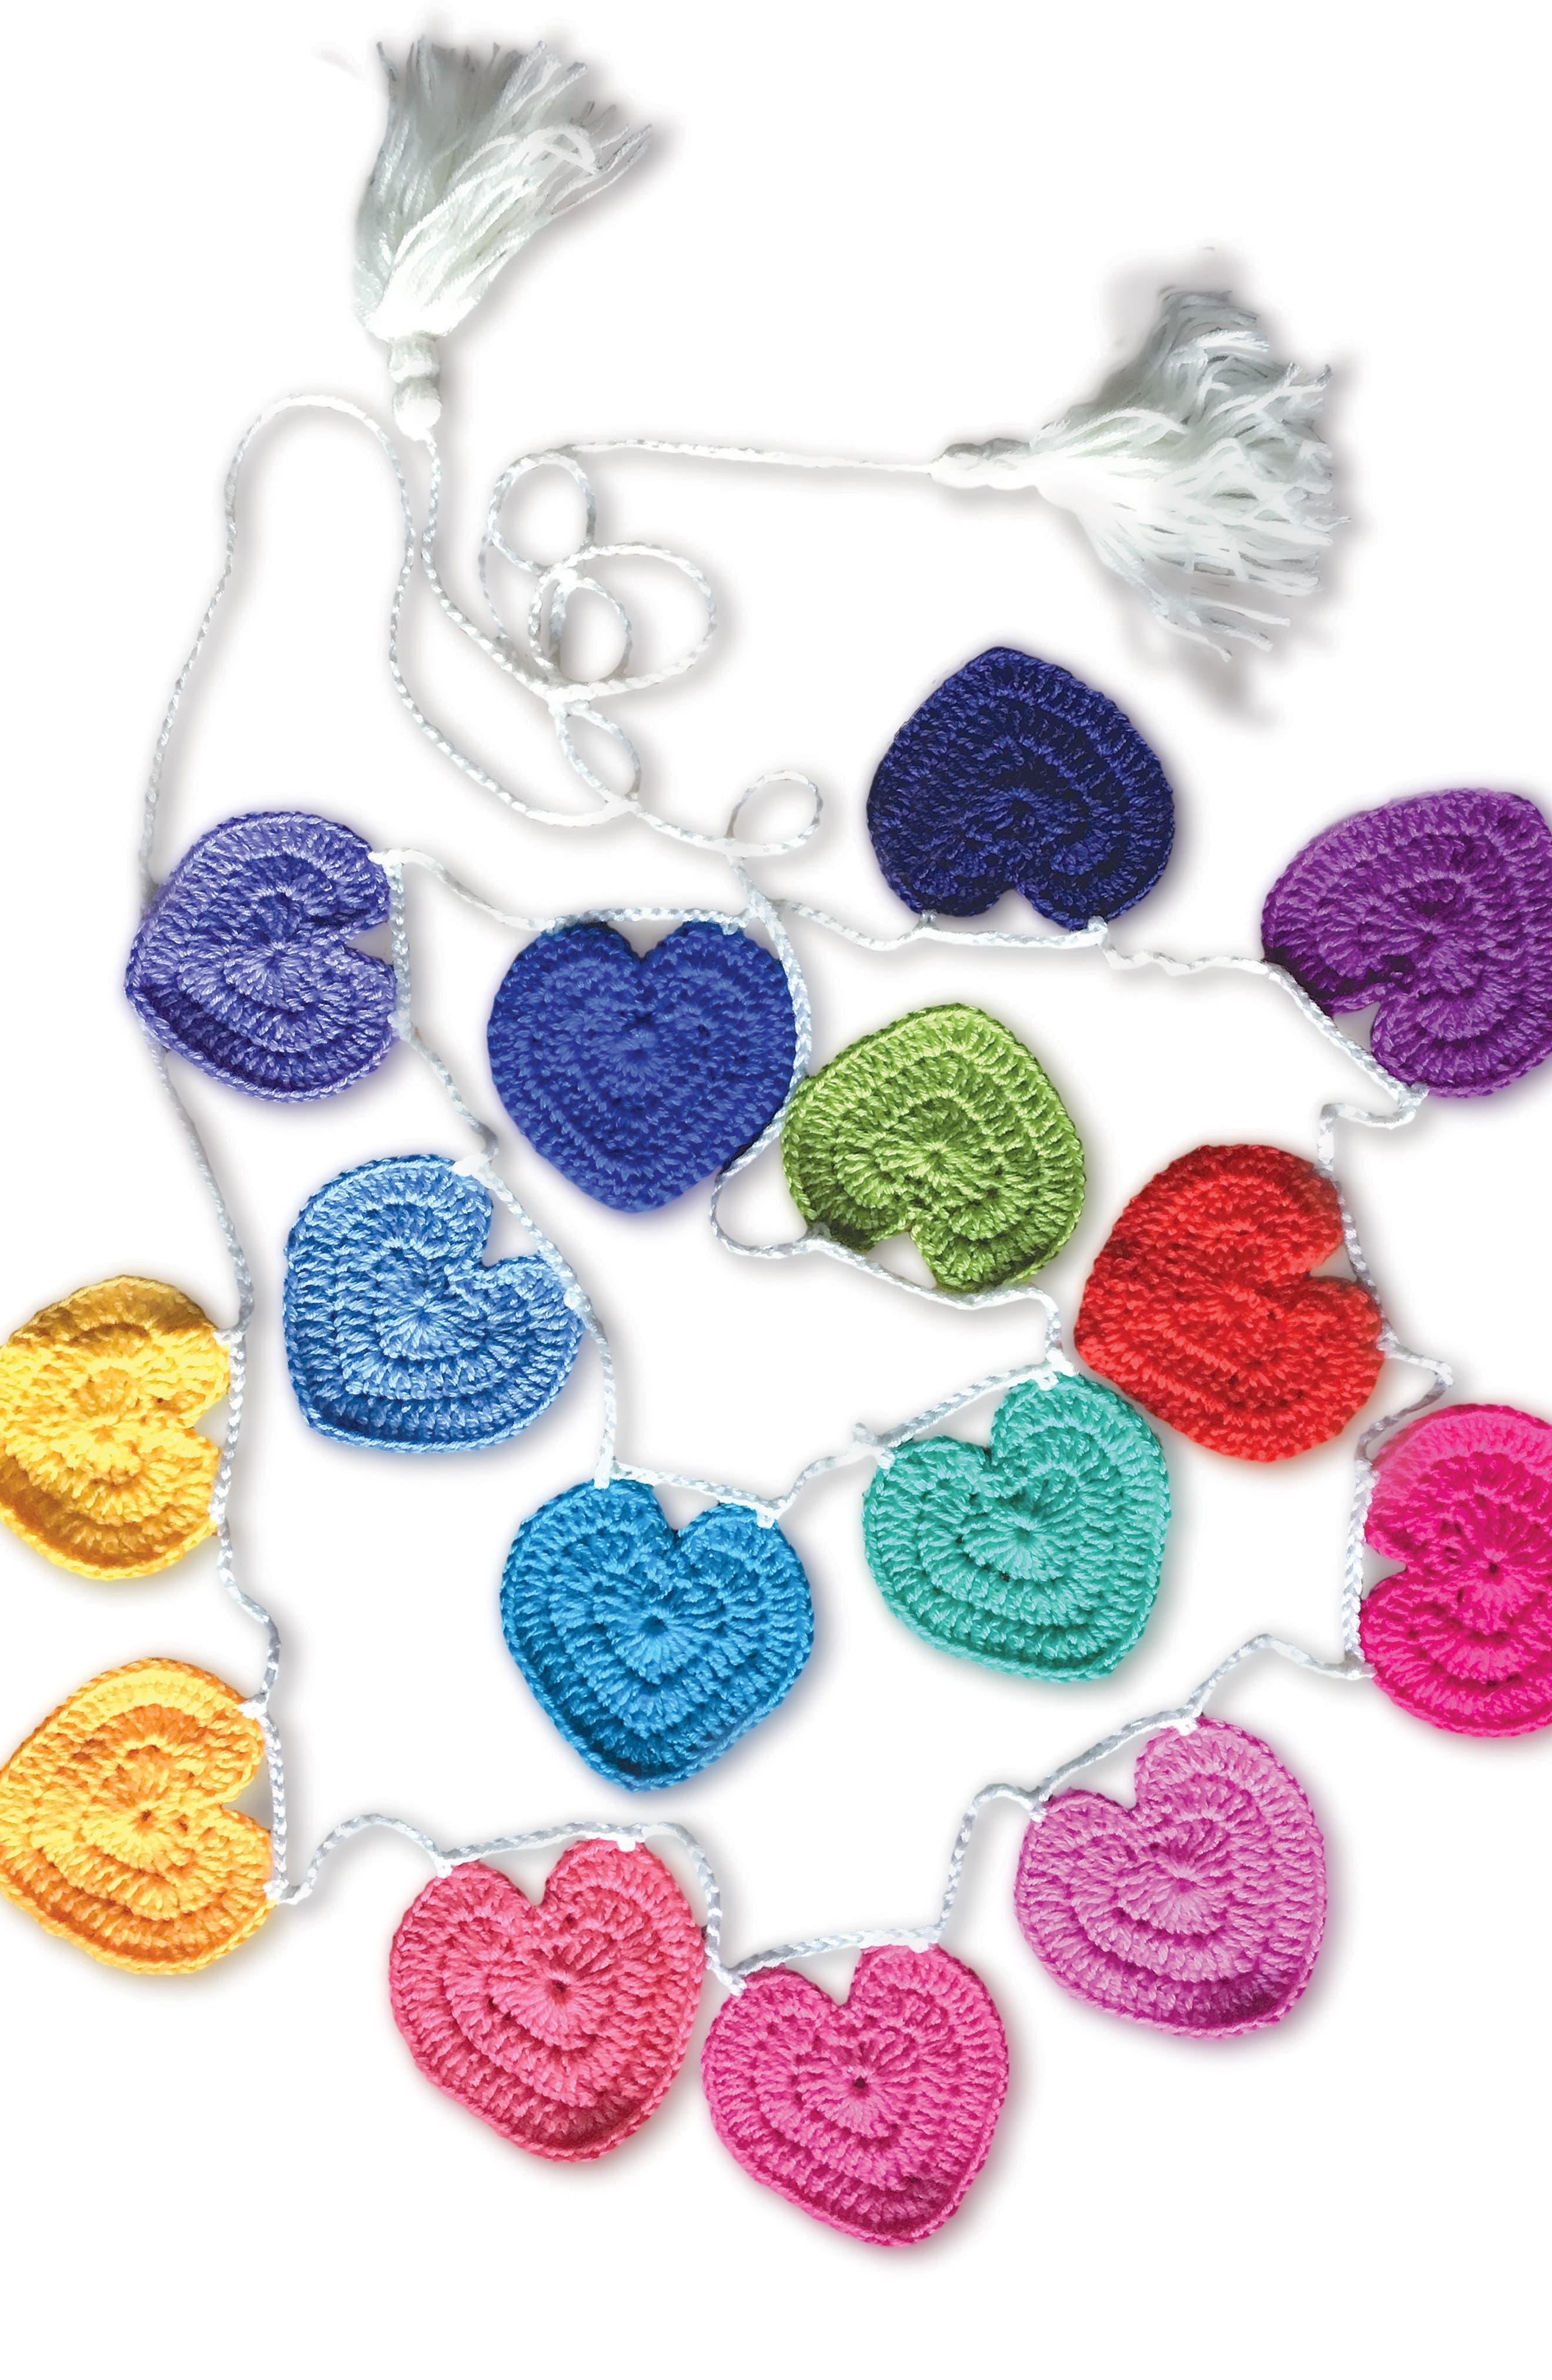 Main Image - O.B. Designs Crocheted Heart Bunting